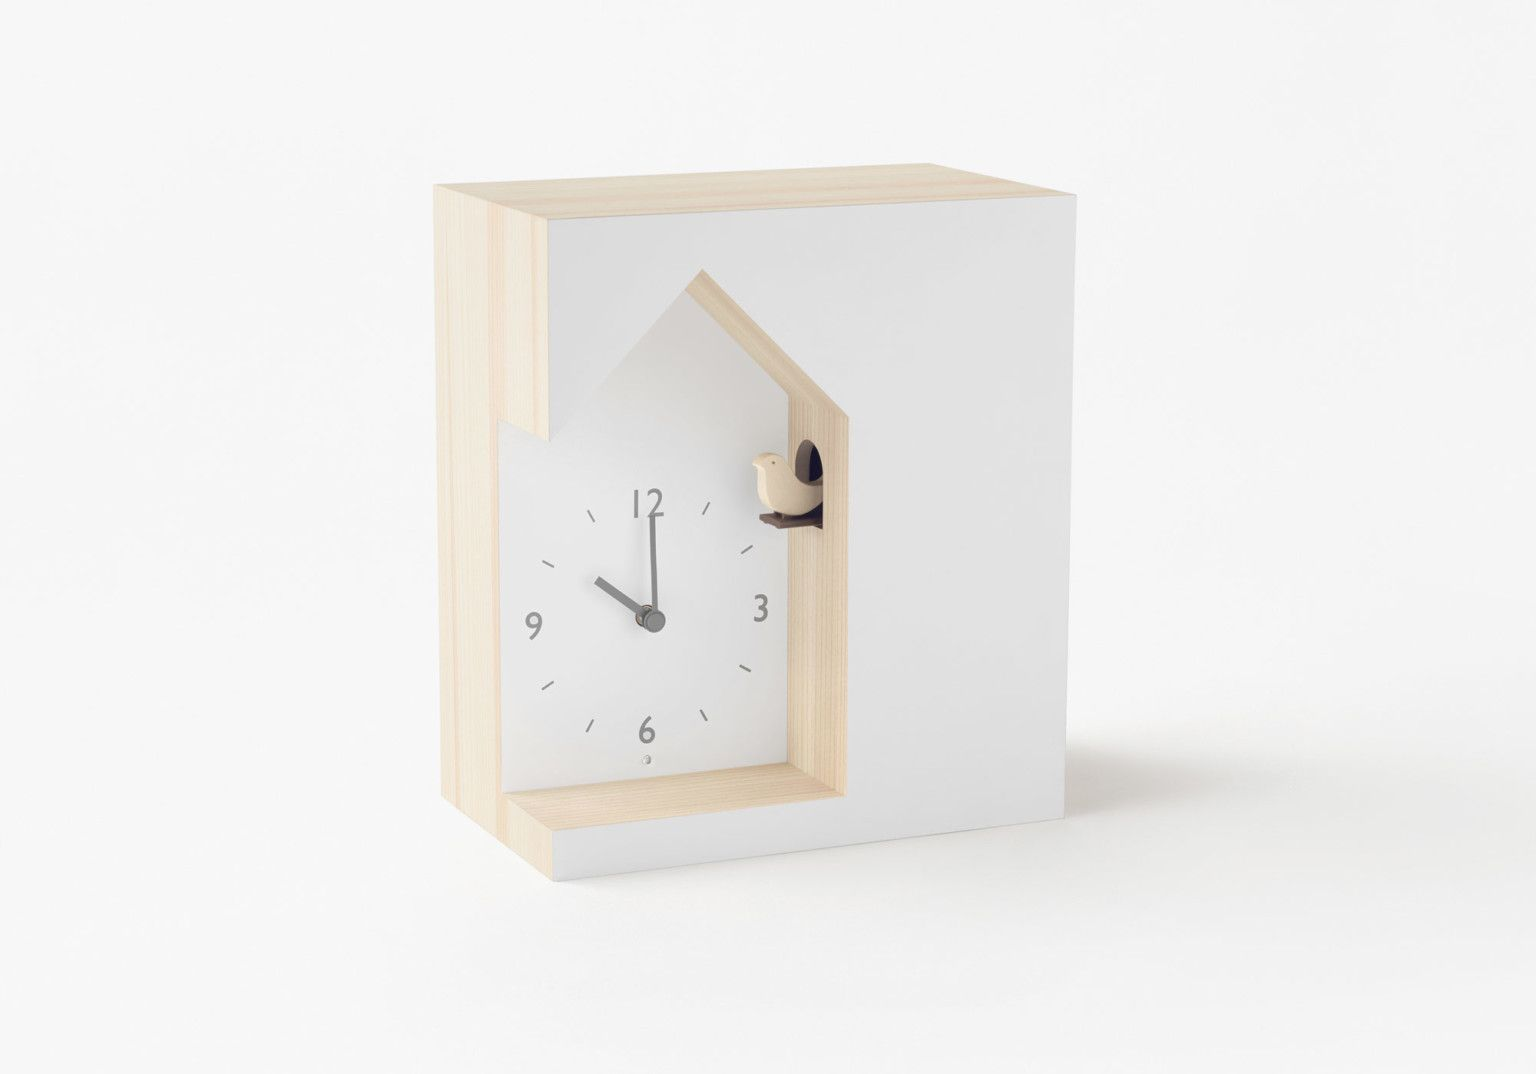 Japanese Design Studio Turns Traditional Cuckoo Clocks On Their Head With Three Minimal Designs Japanese Design Clock Cuckoo Clock